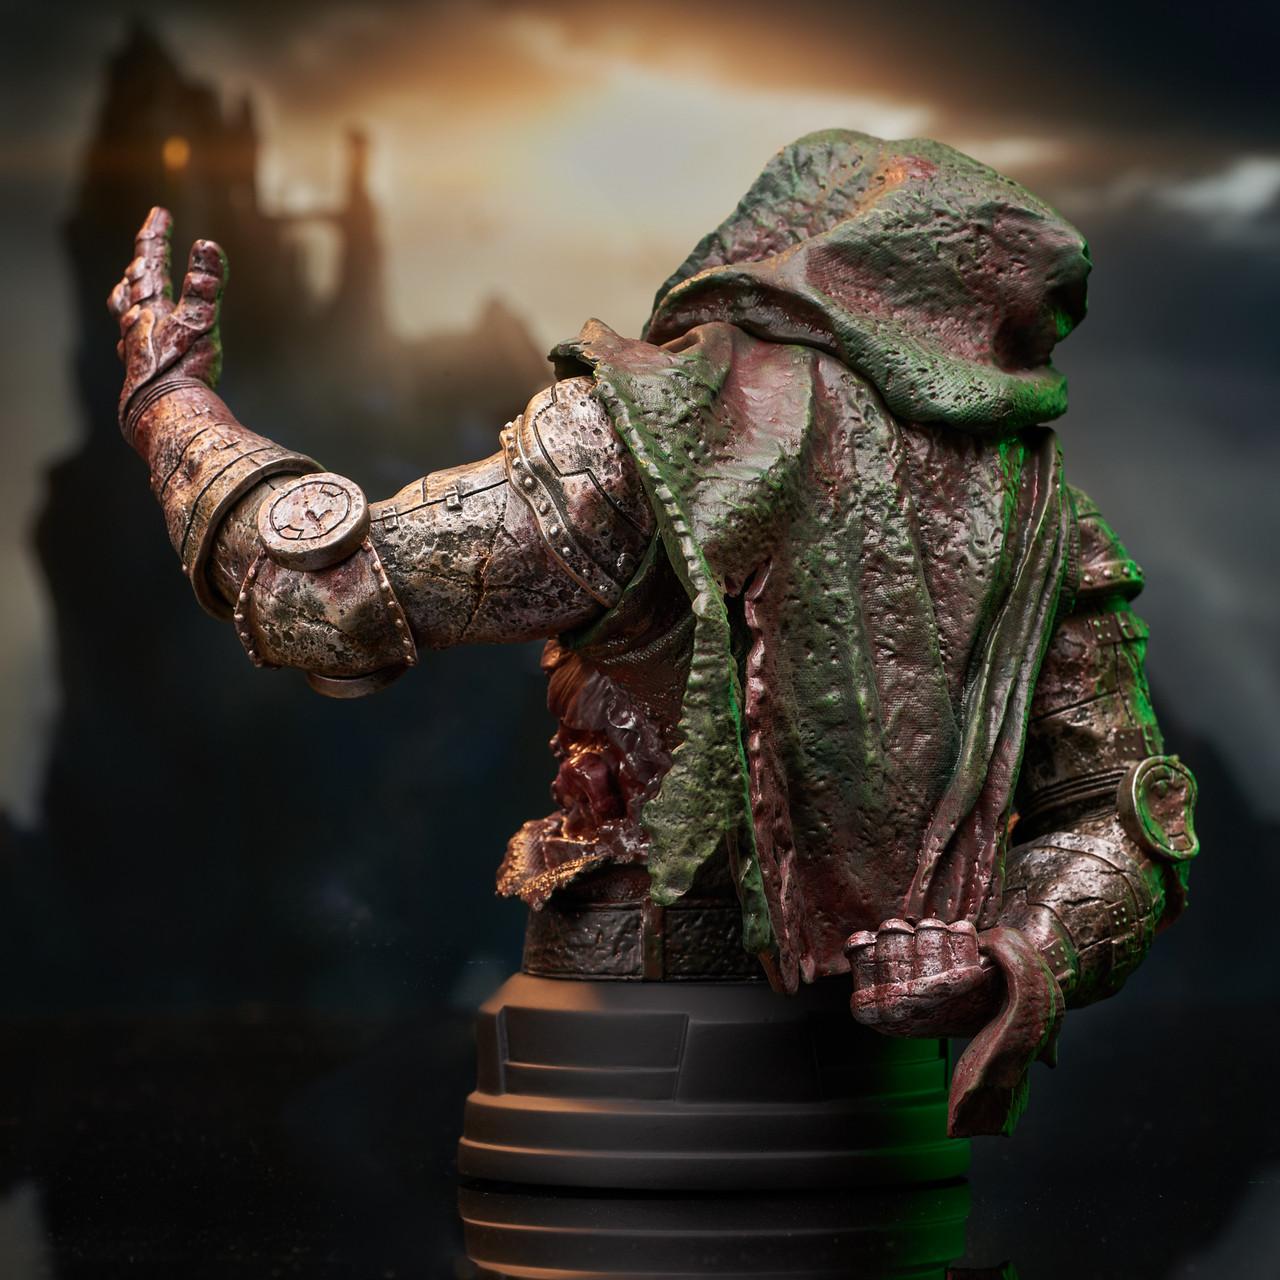 Doctor Doom (Zombie) Mini Bust - 2021 NYCC Exclusive Marvel_ZombieDoom_Bust_03__13362.1628206892